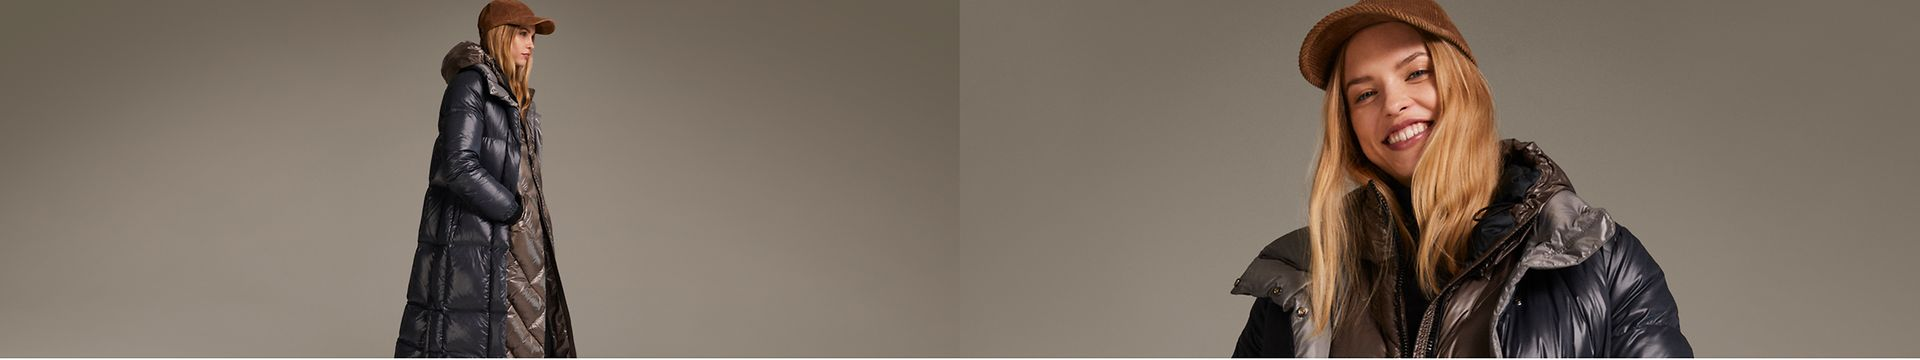 422021 - women - pov banner - outerwear Guide - IMG